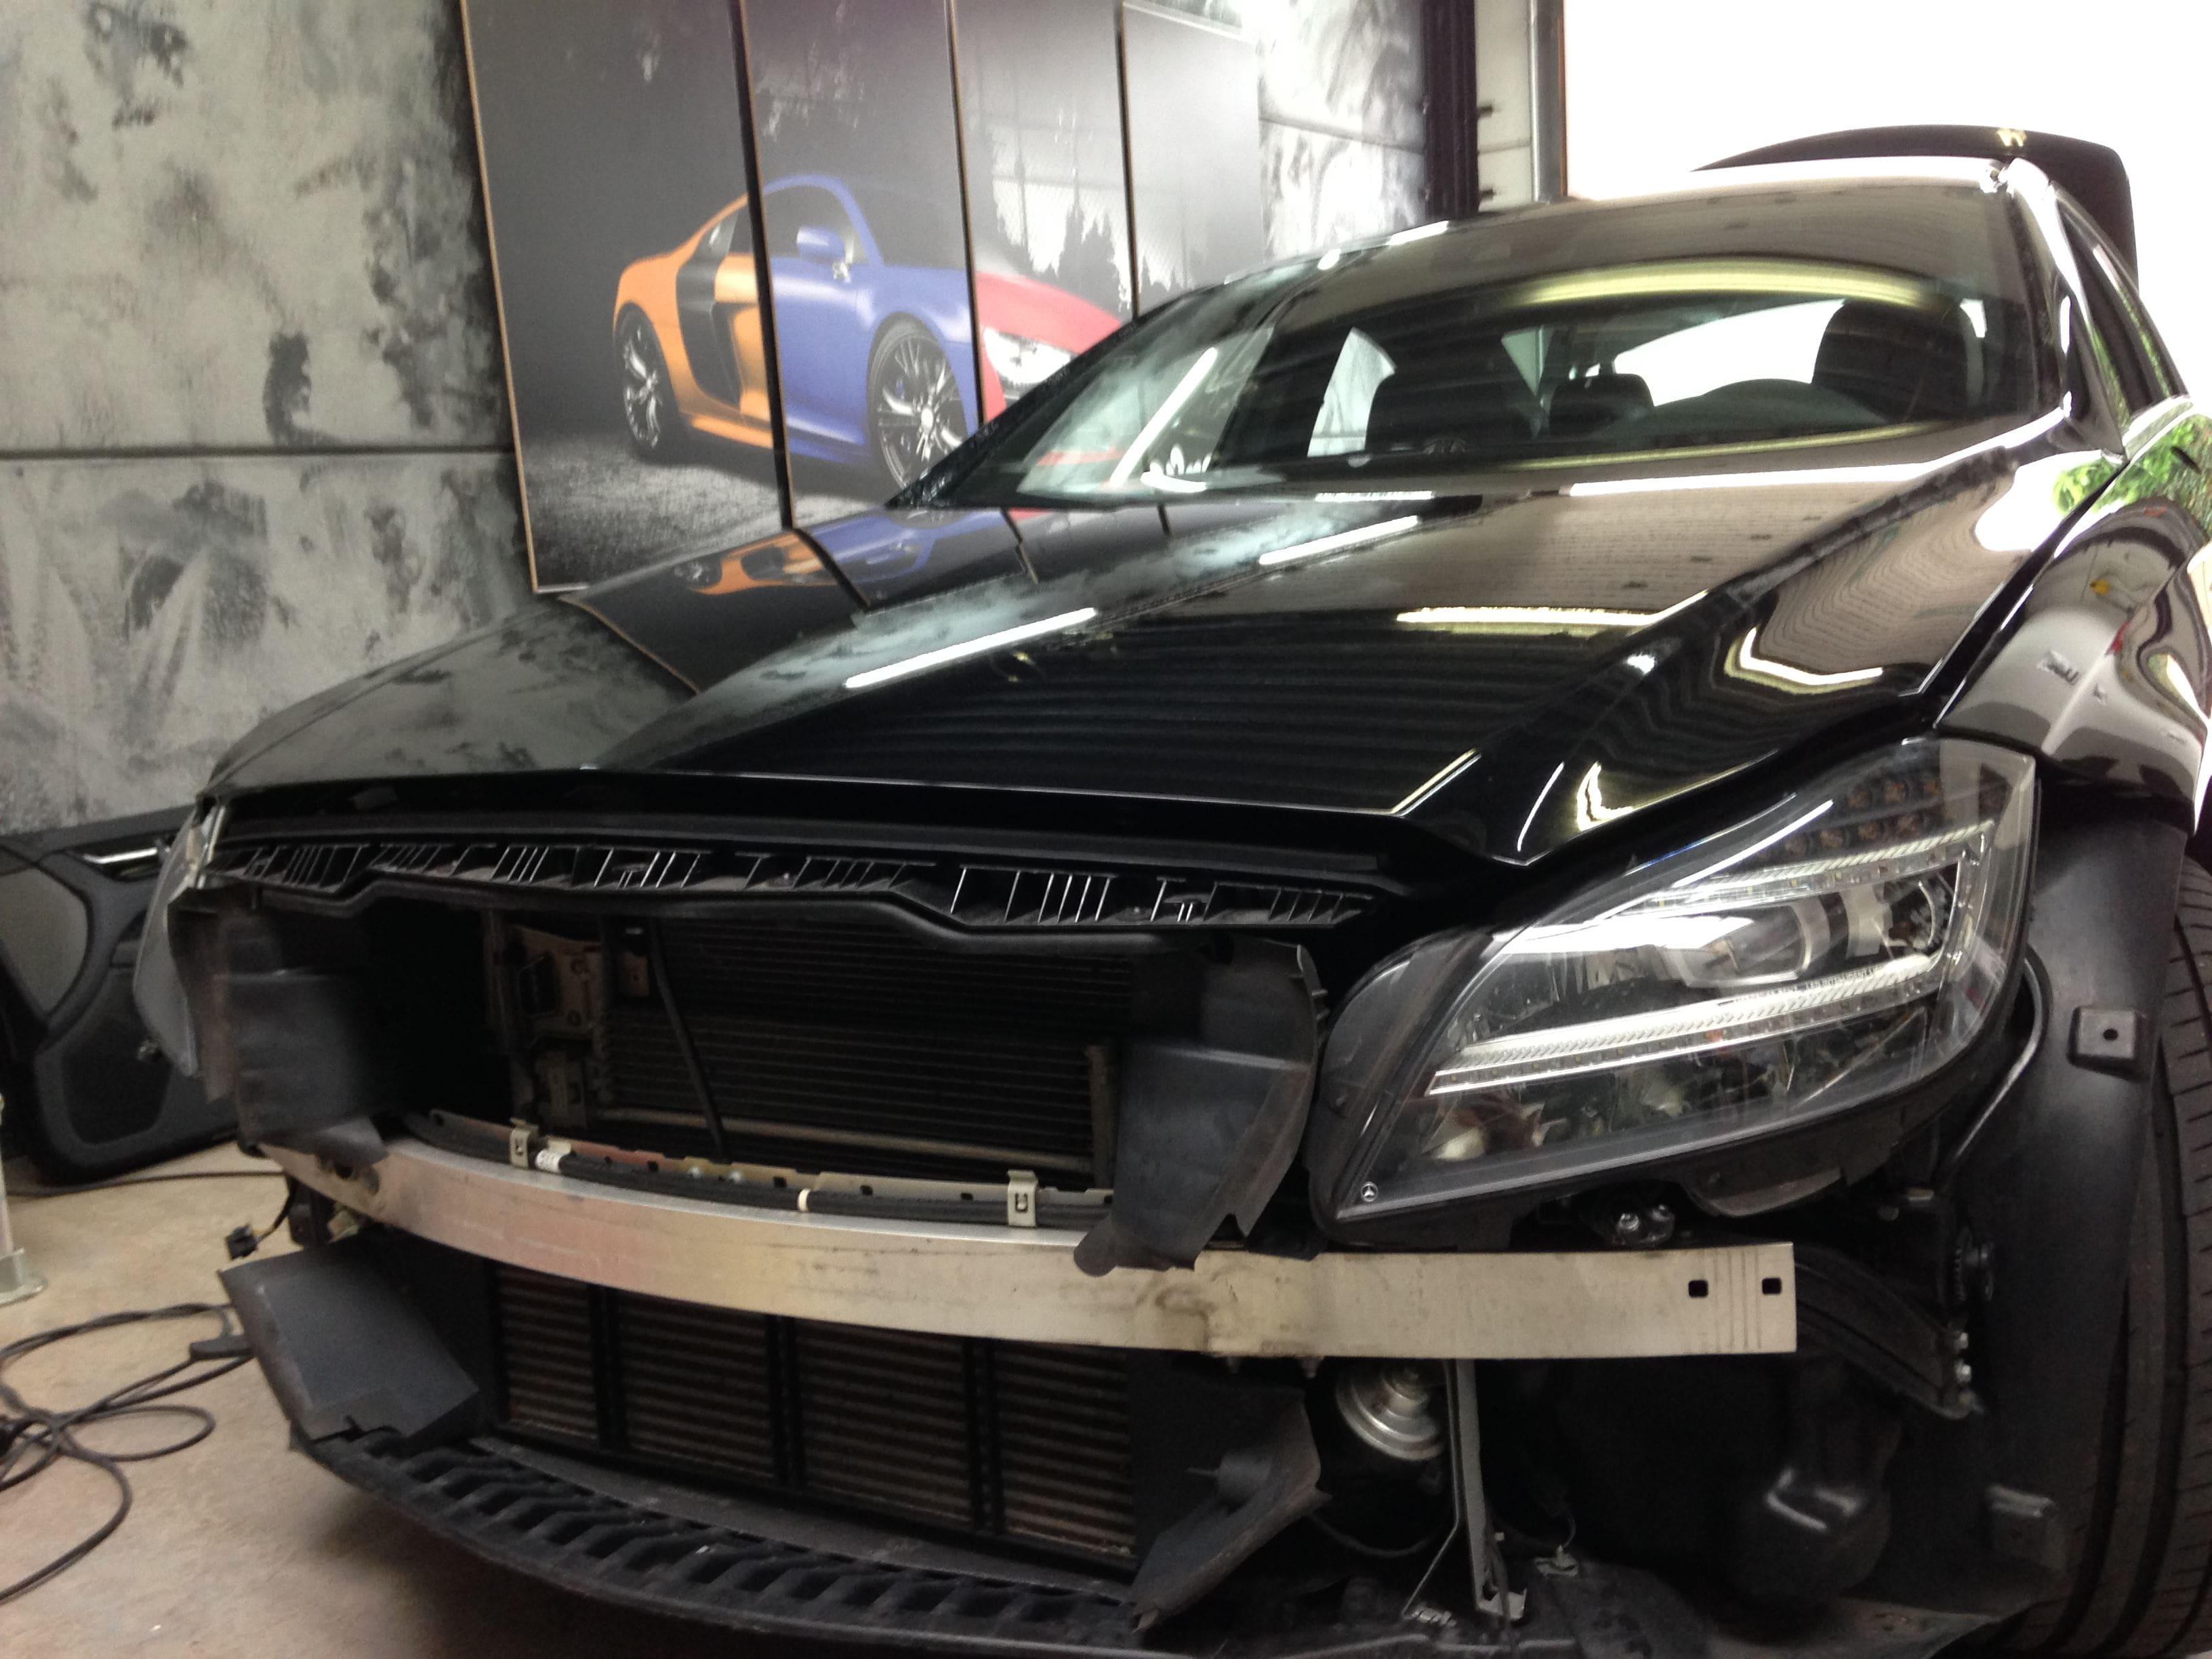 Mercedes CLS met Mat Grey Aluminium Wrap, Carwrapping door Wrapmyride.nu Foto-nr:6127, ©2020